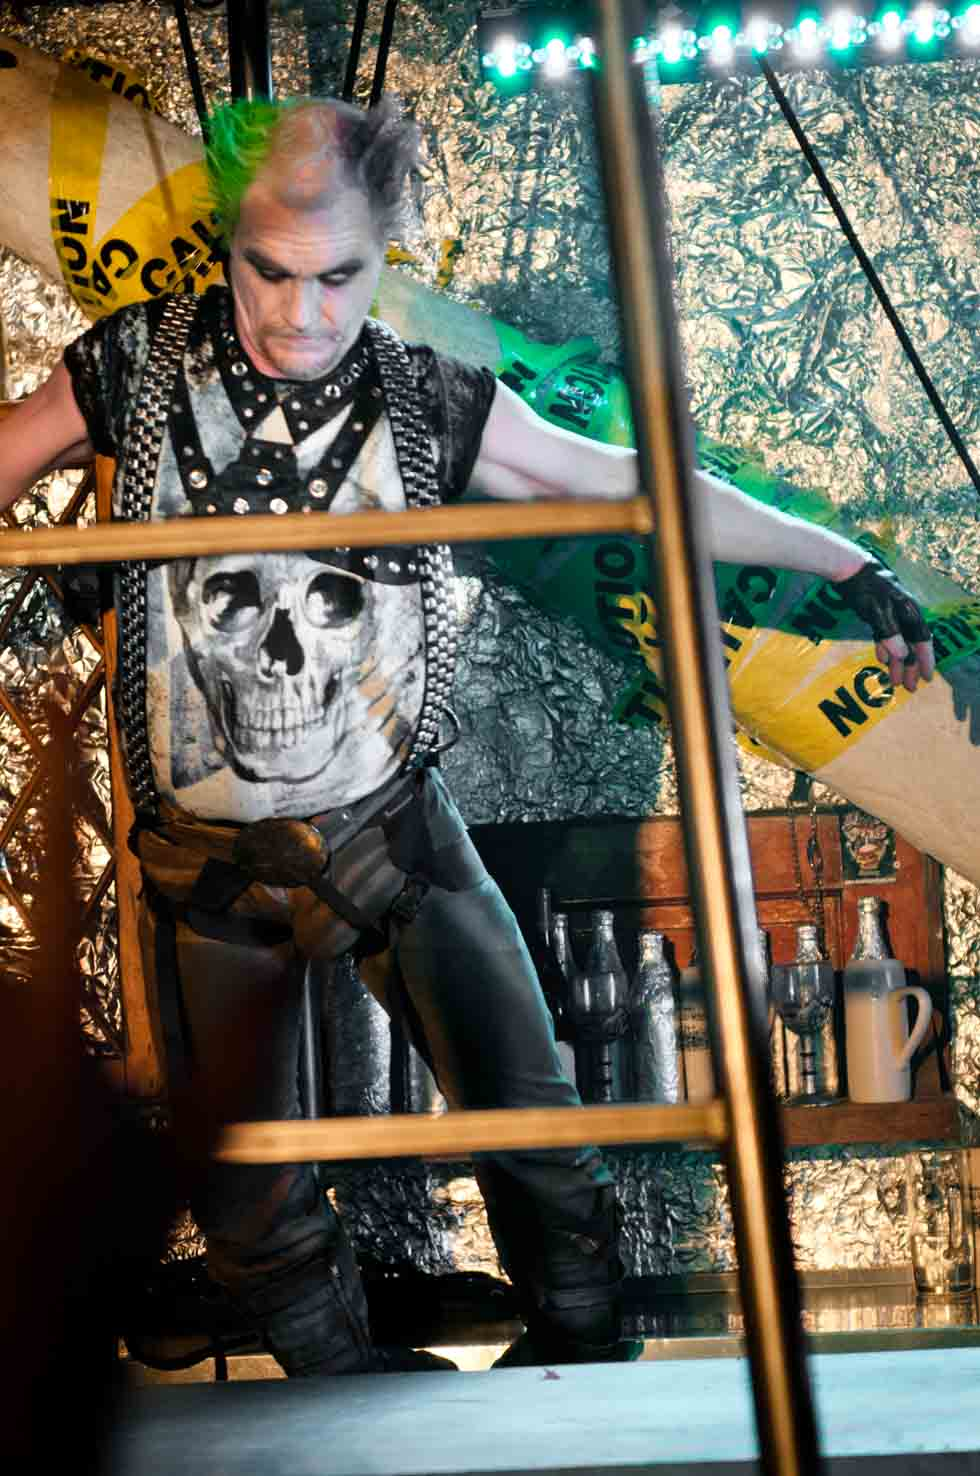 zum-schneider-nyc-2012-karneval-apocalyptika-4972.jpg